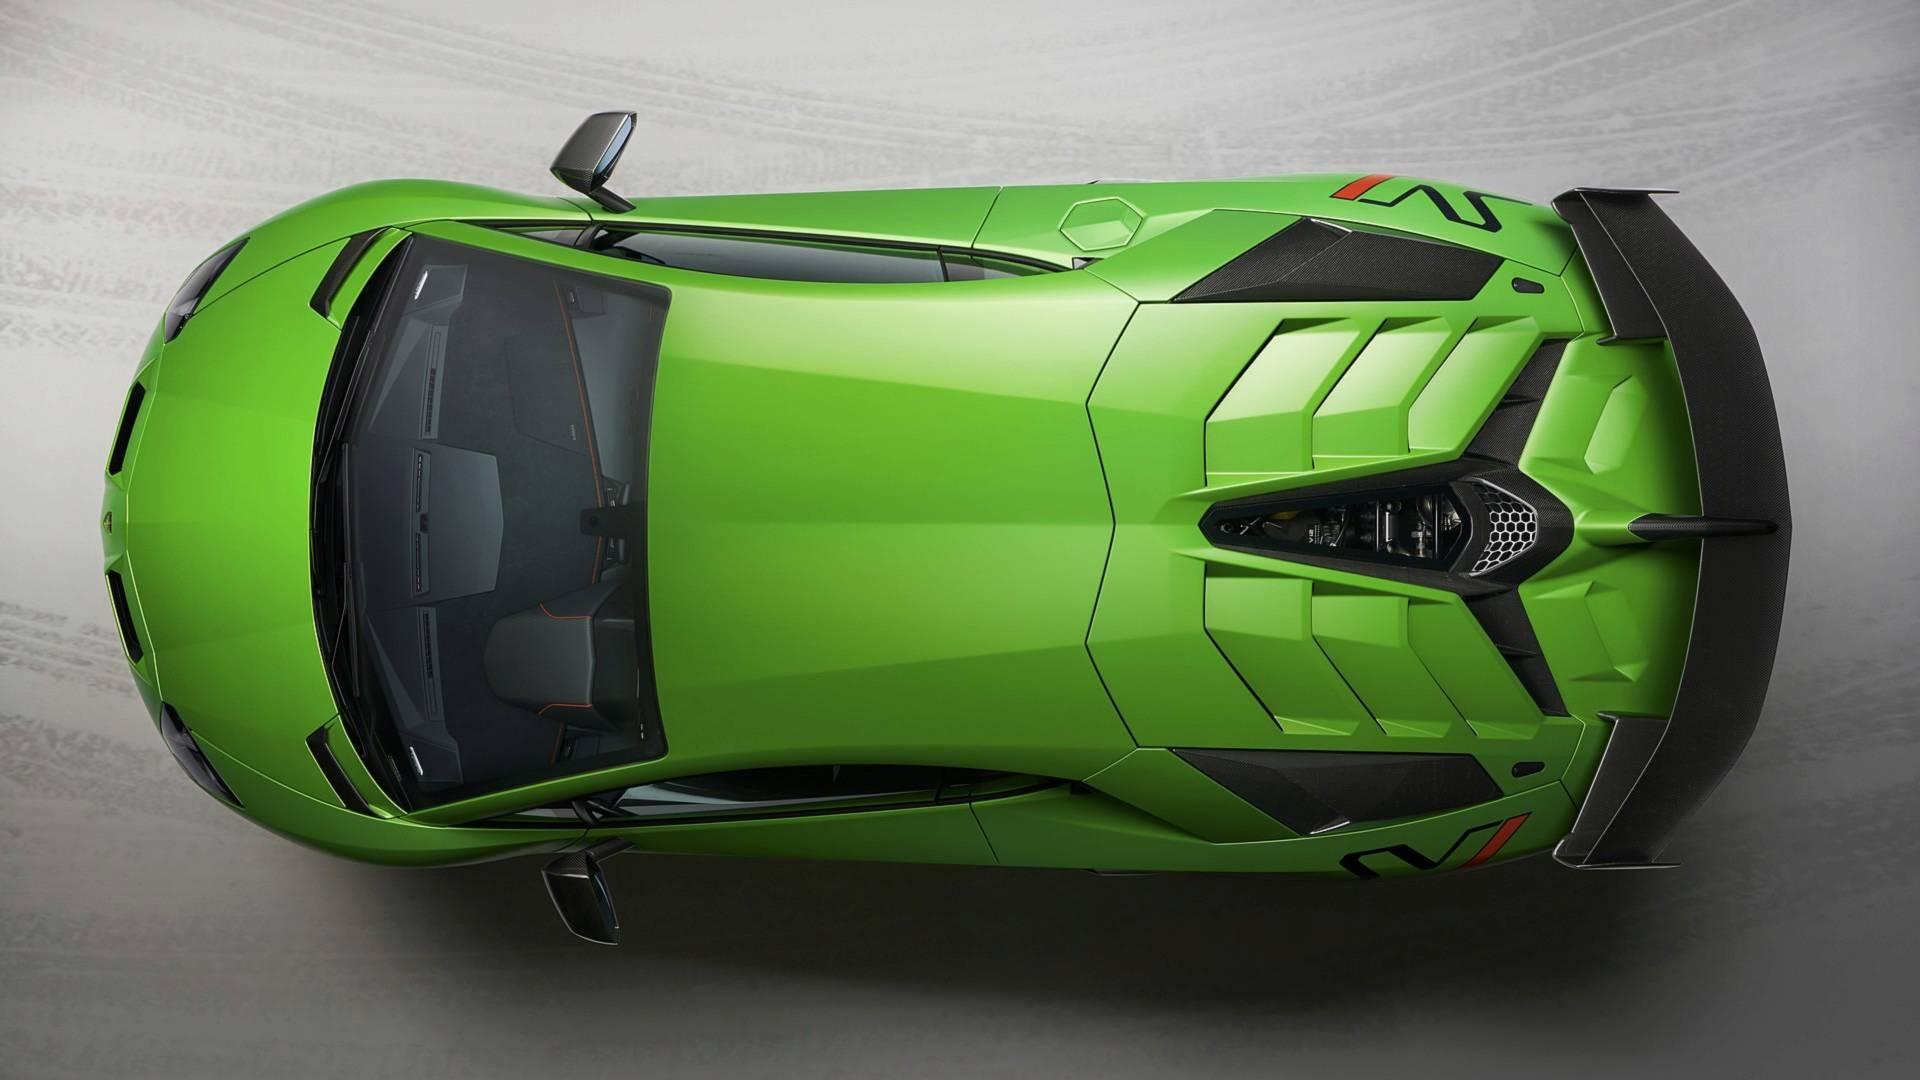 Lamborghini Veneno Roadster Wallpaper Hd 2019 Lamborghini Aventador Svj Revealed Priced At